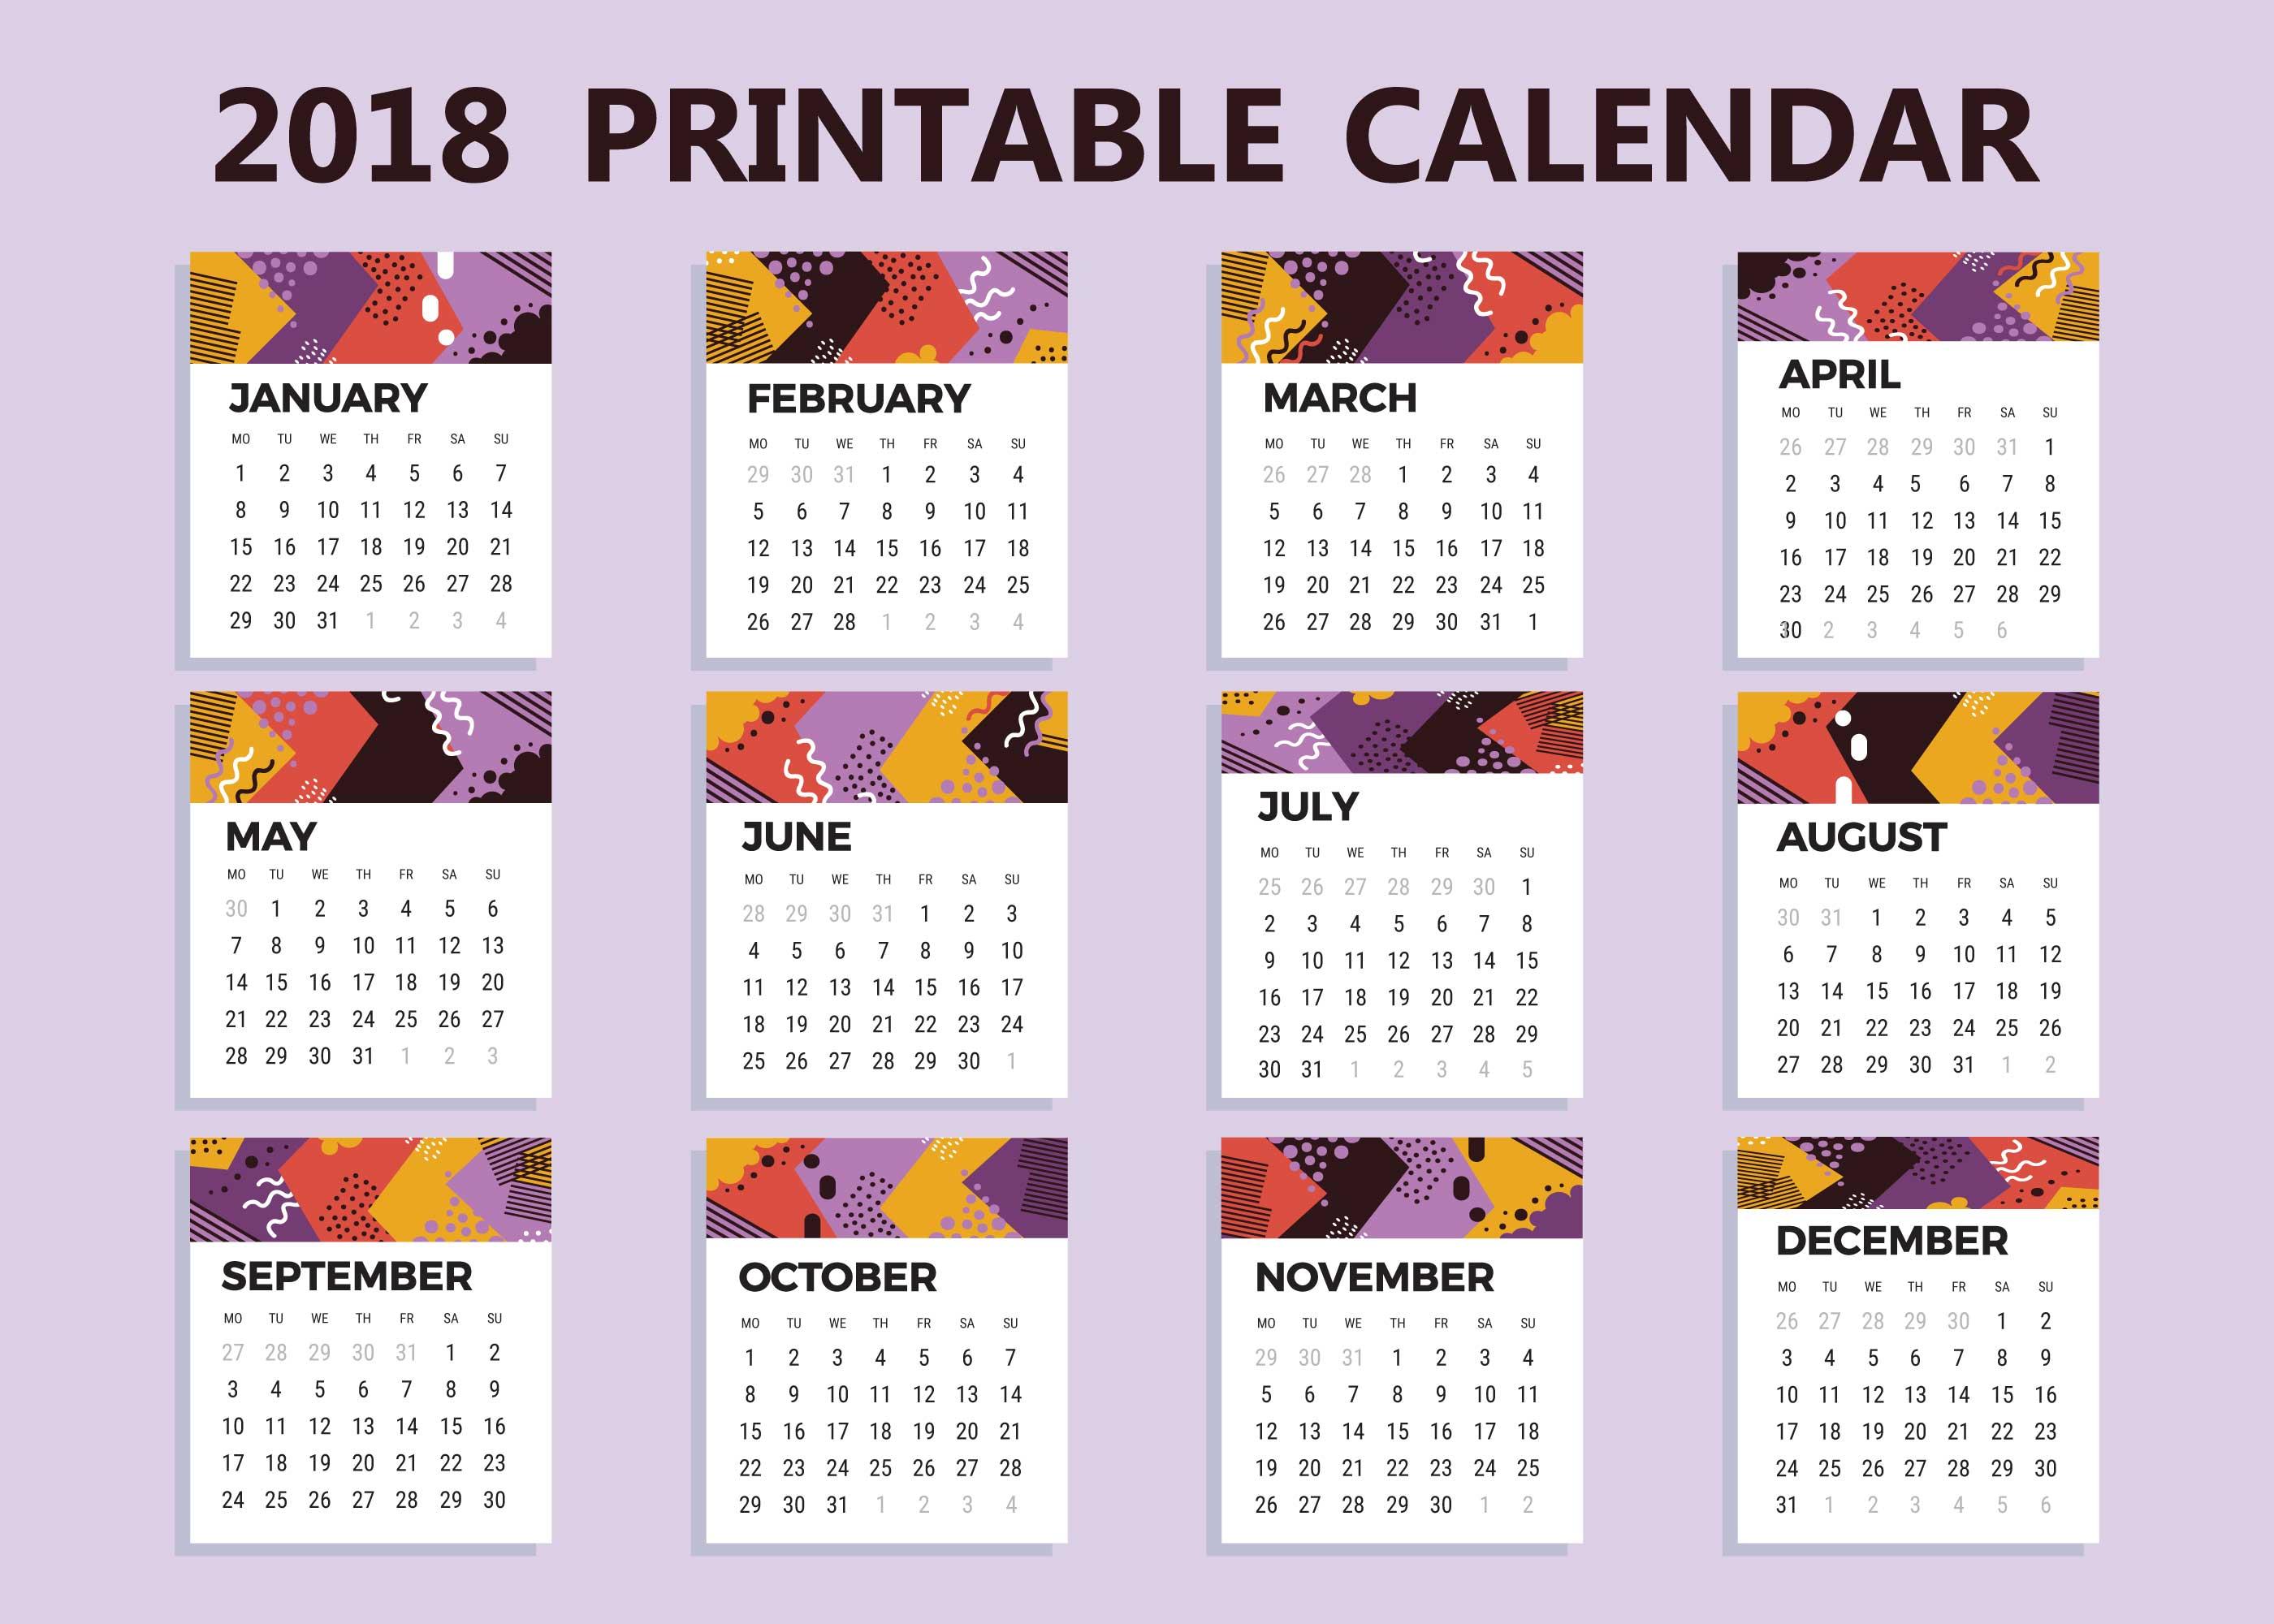 Blank Calendar Svg : Free printable calendar vector download